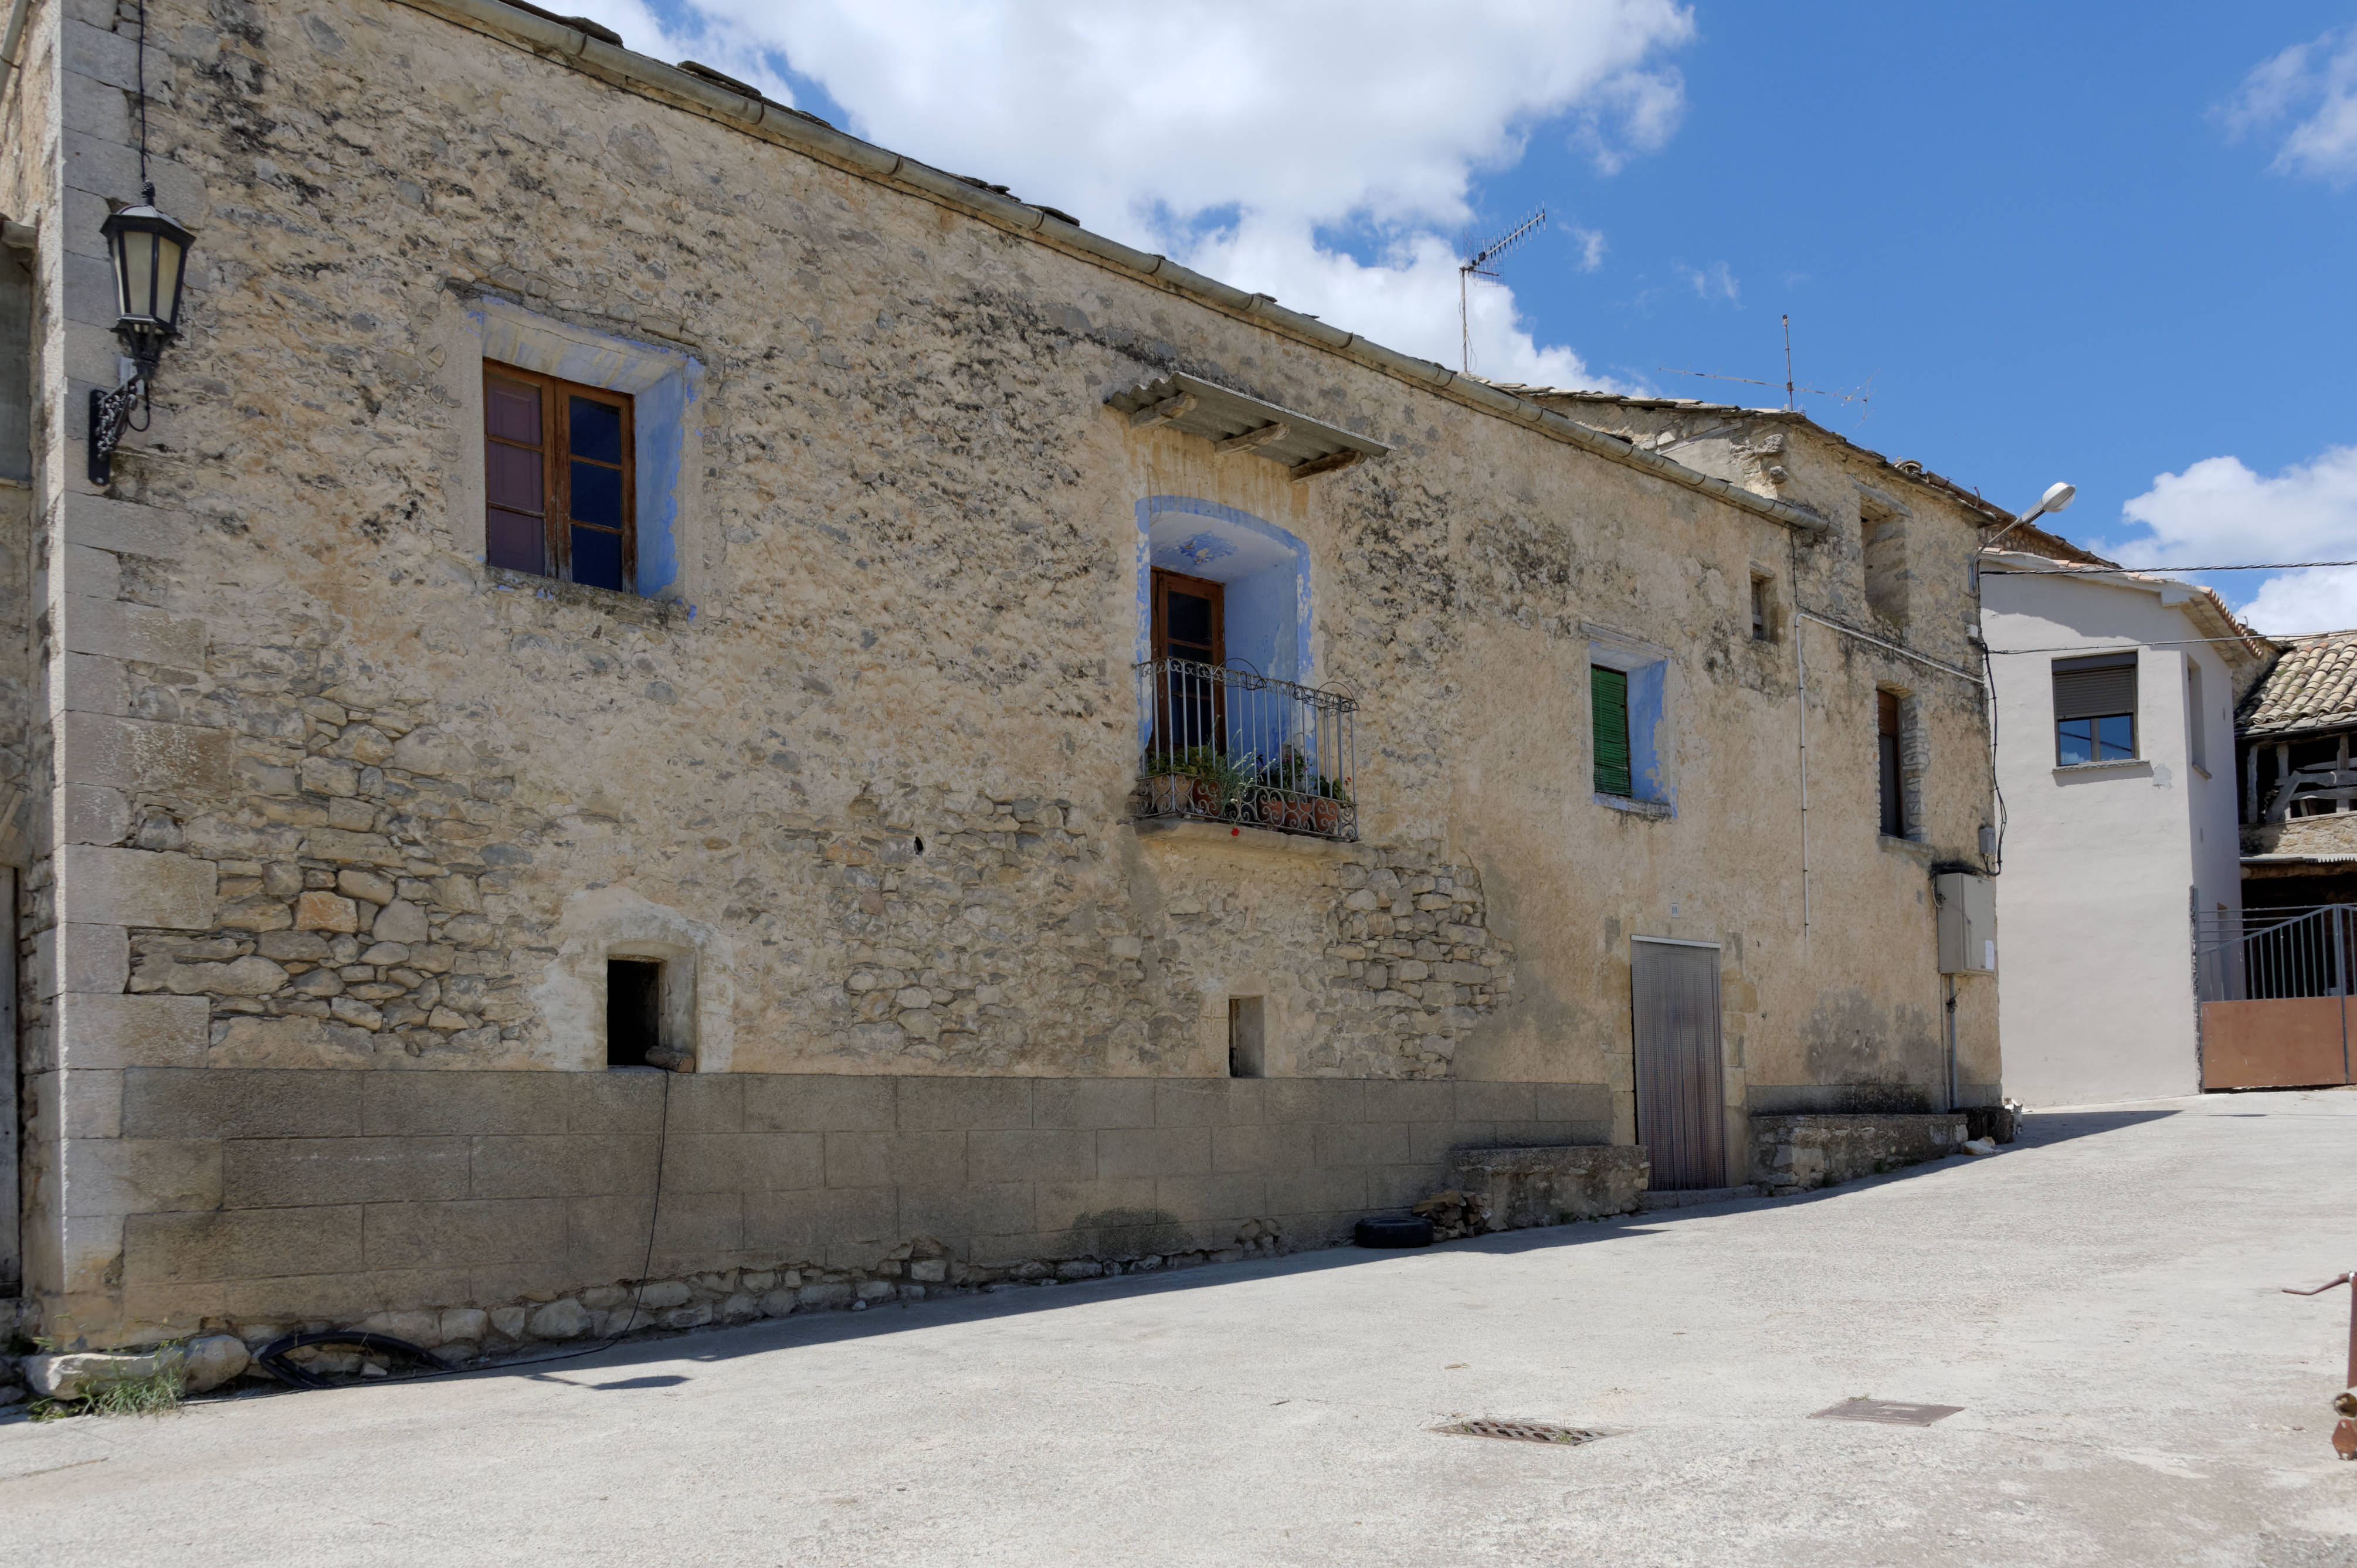 6777_Paules de Sarsa (Sobrarbe)